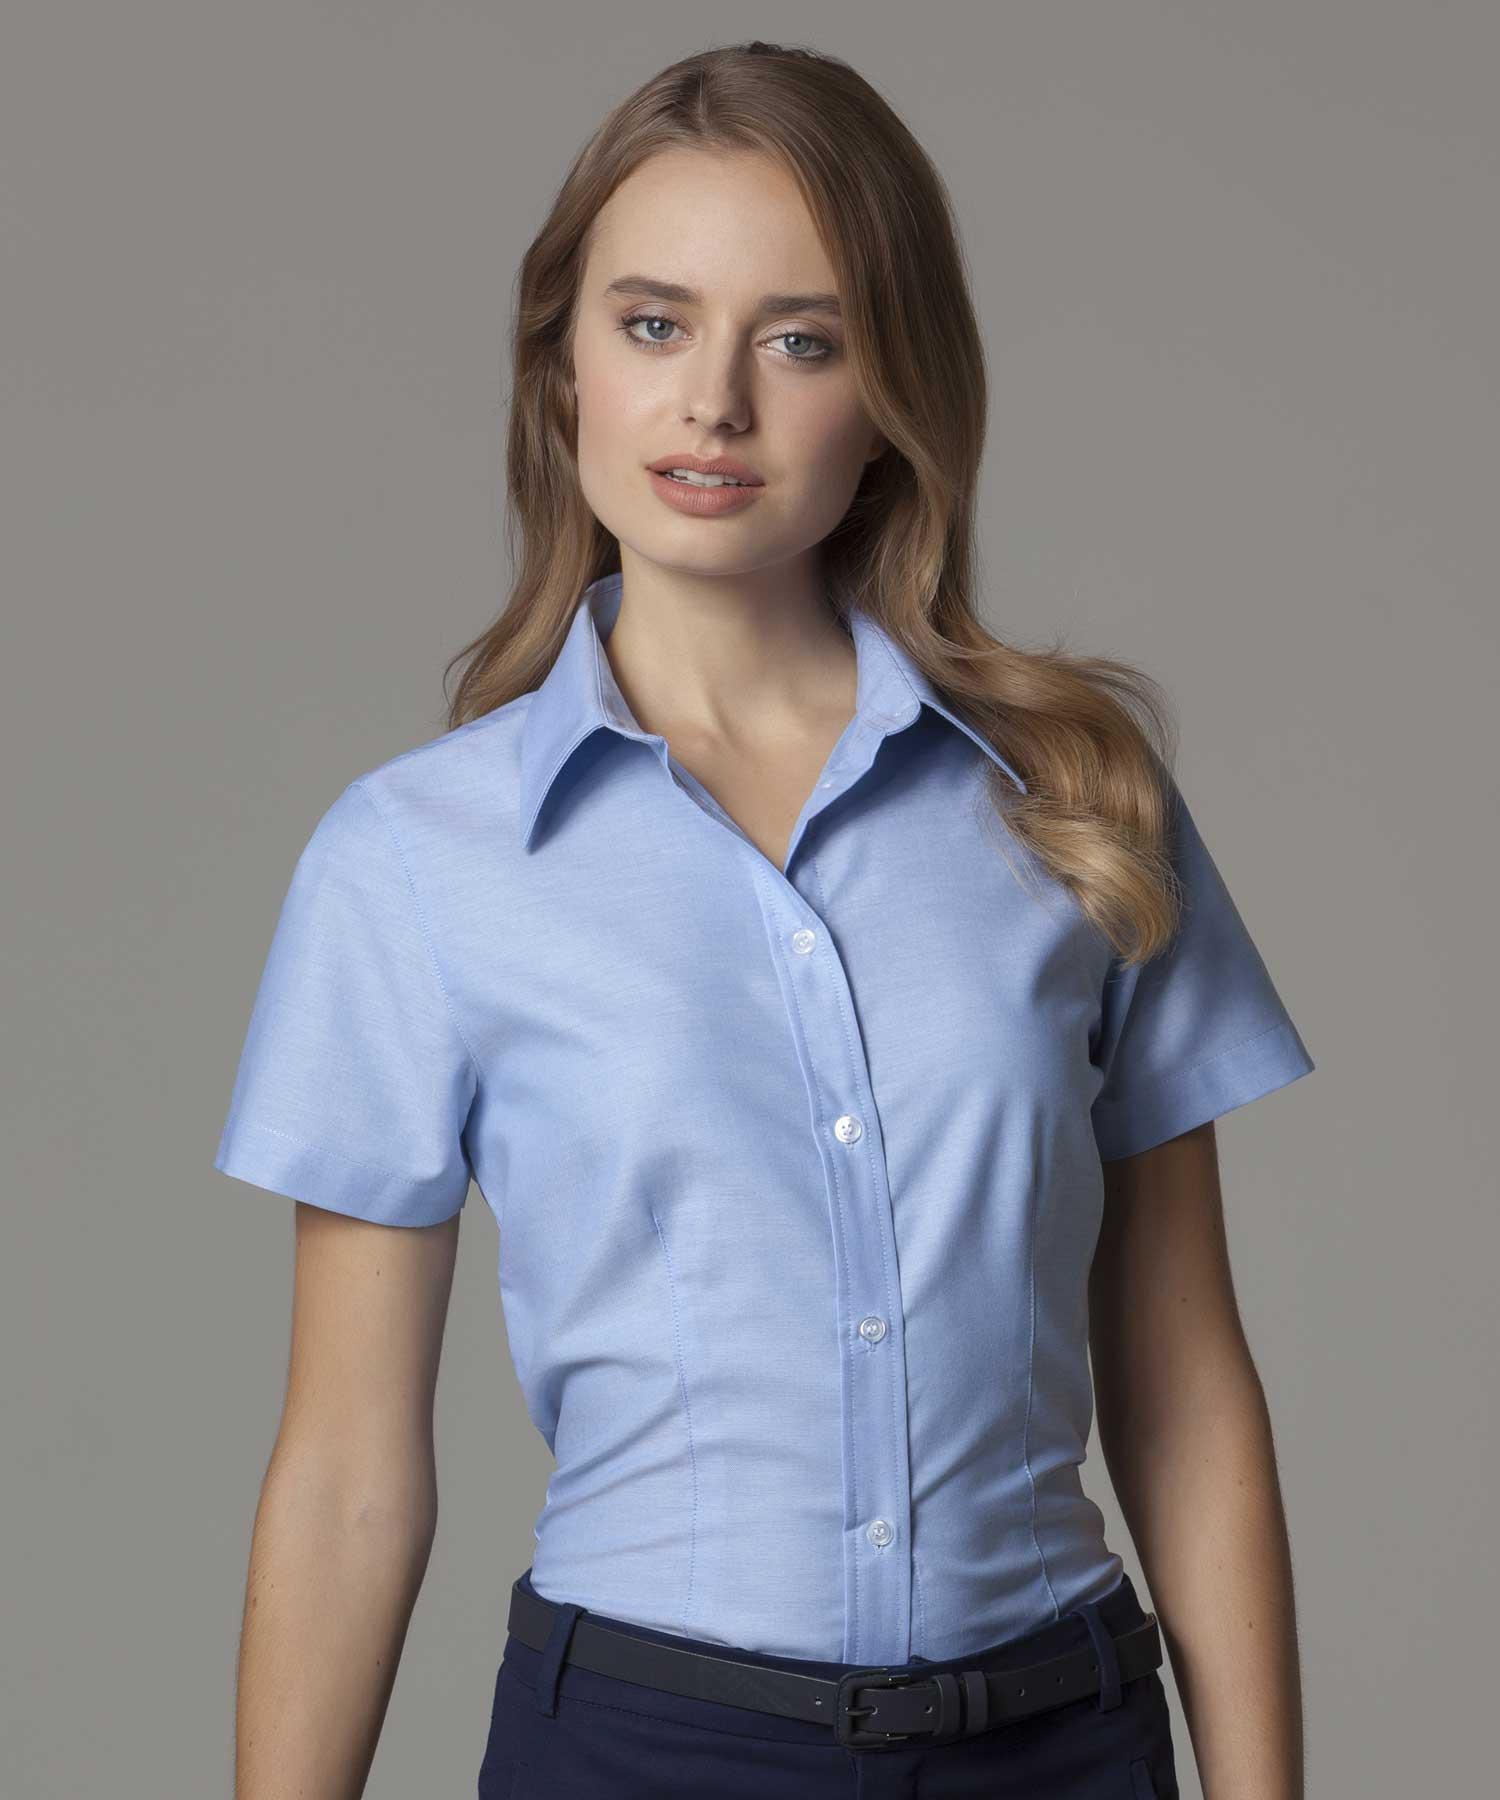 Kustom Kit Ladies Short Sleeve Workwear Oxford Shirt Sew